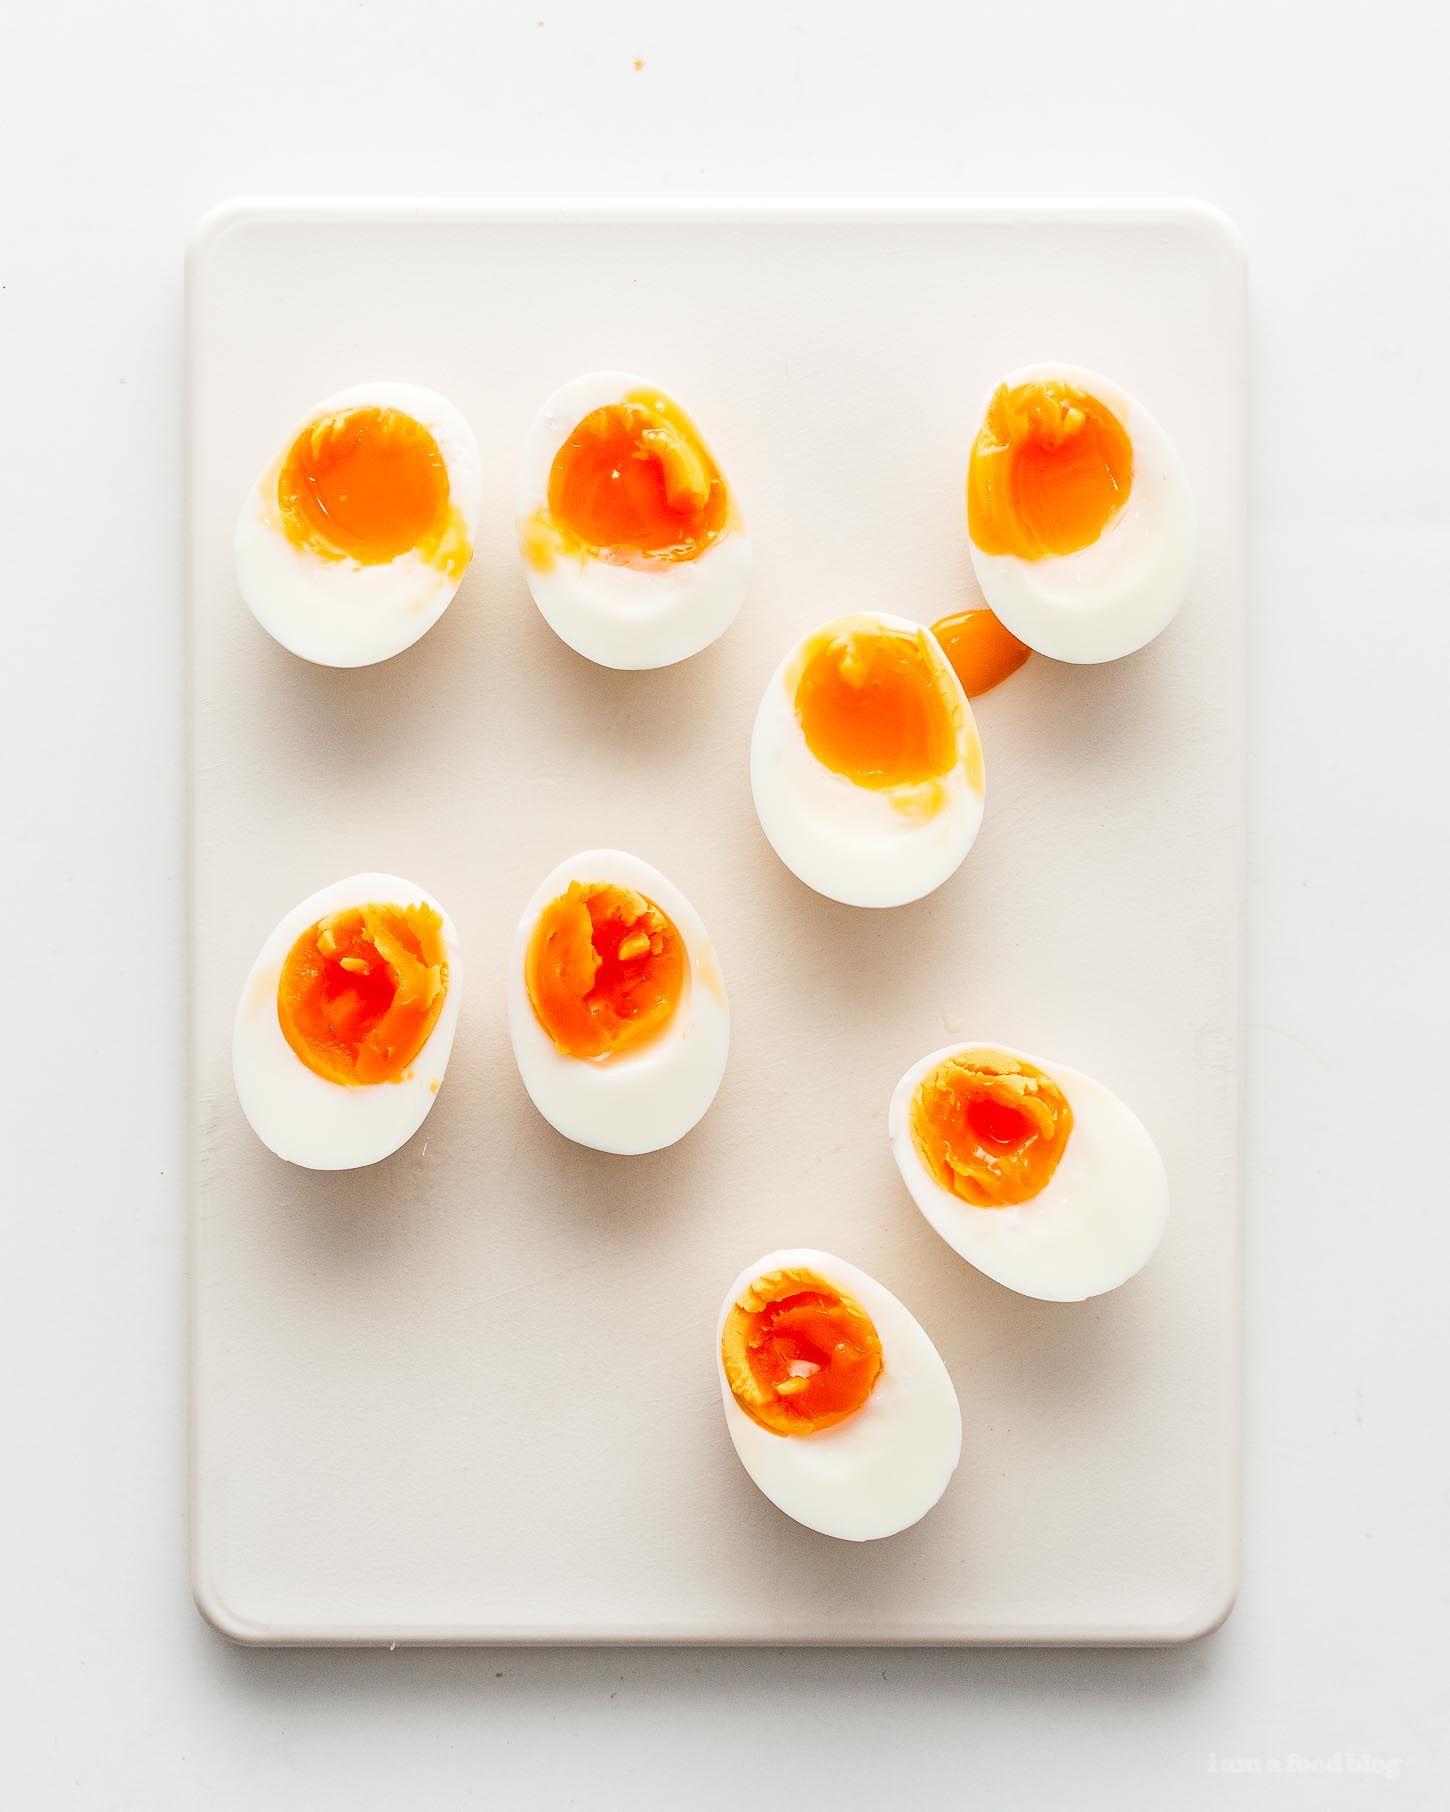 How To Make Jammy Soft Boiled Eggs Recipe I Am A Food Blog Recipe Boiled Egg Recipes Soft Boiled Eggs Soft Boiled Eggs Recipe